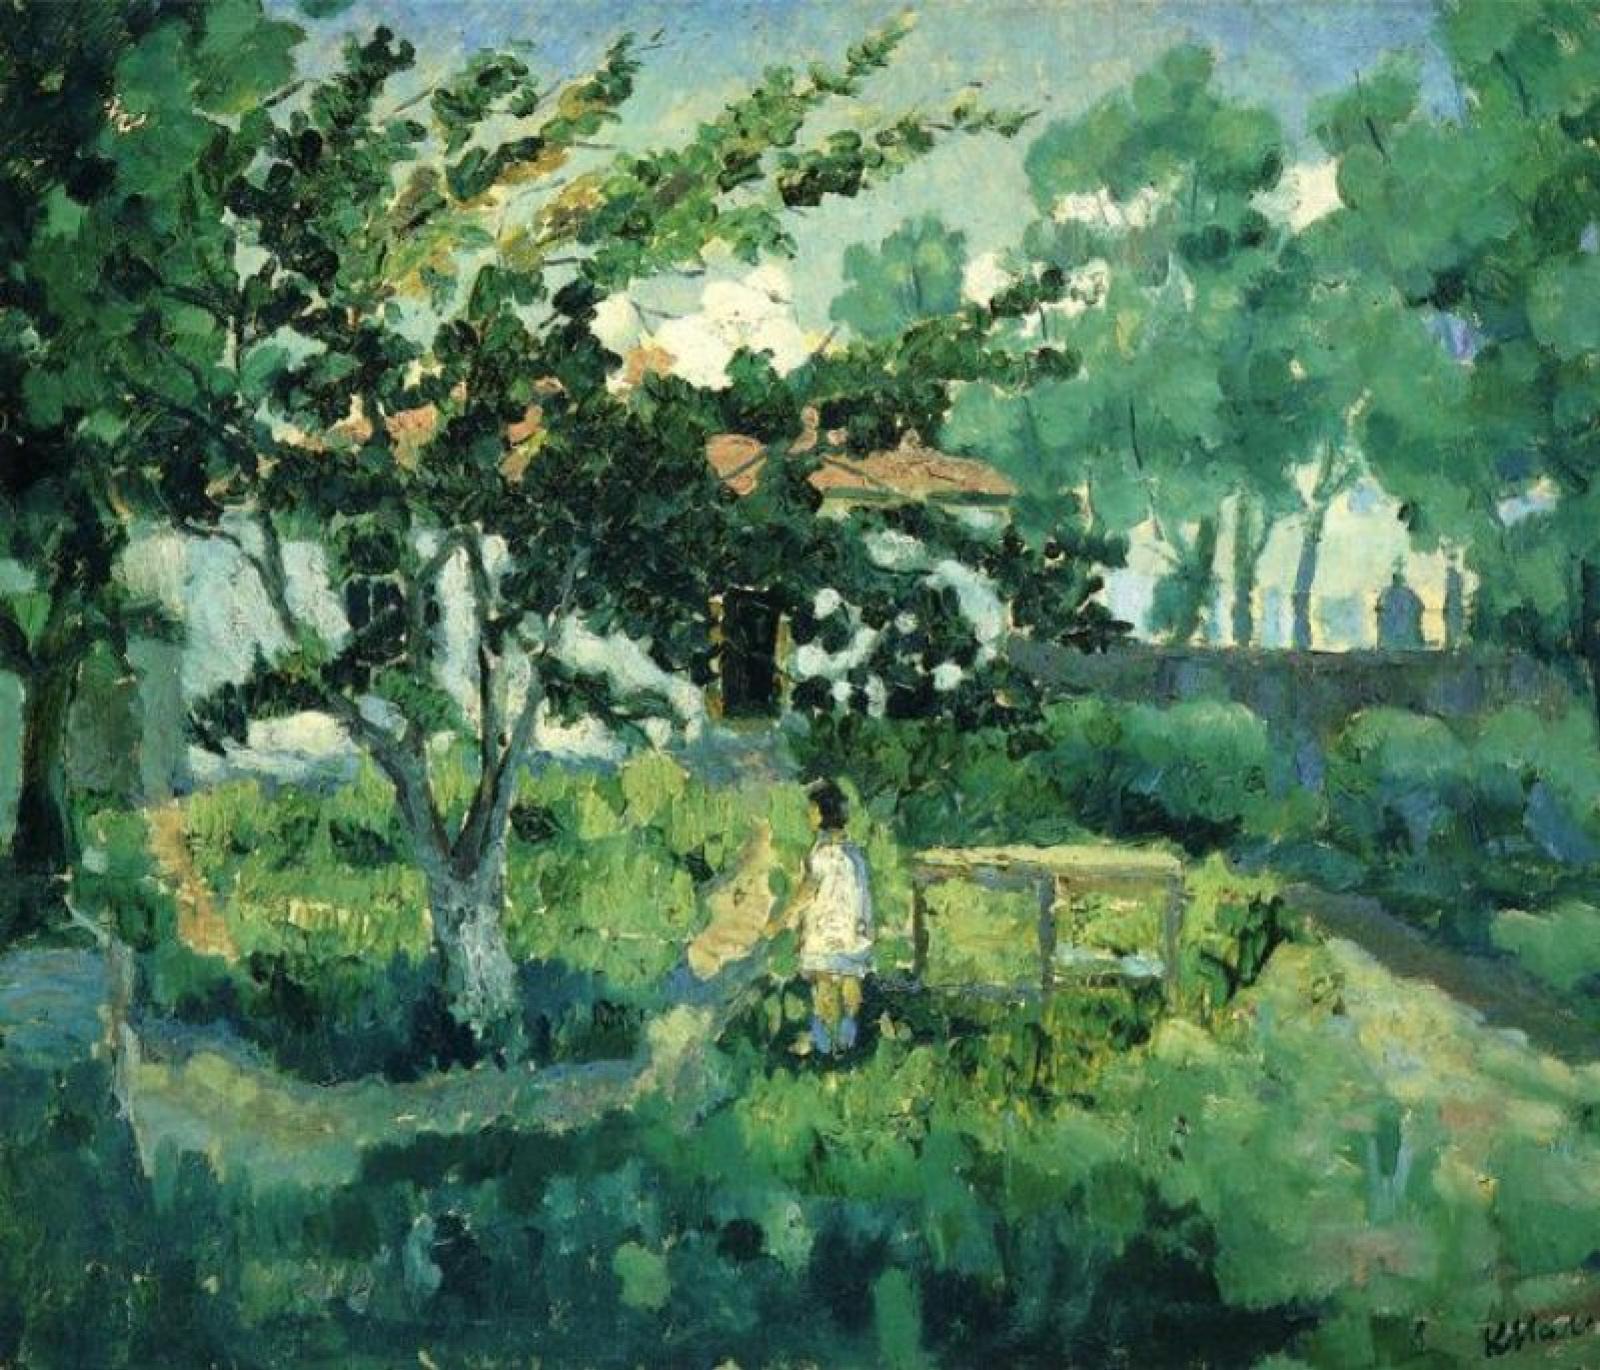 Казимир Малевич, 1929 год, картина «Летний пейзаж».